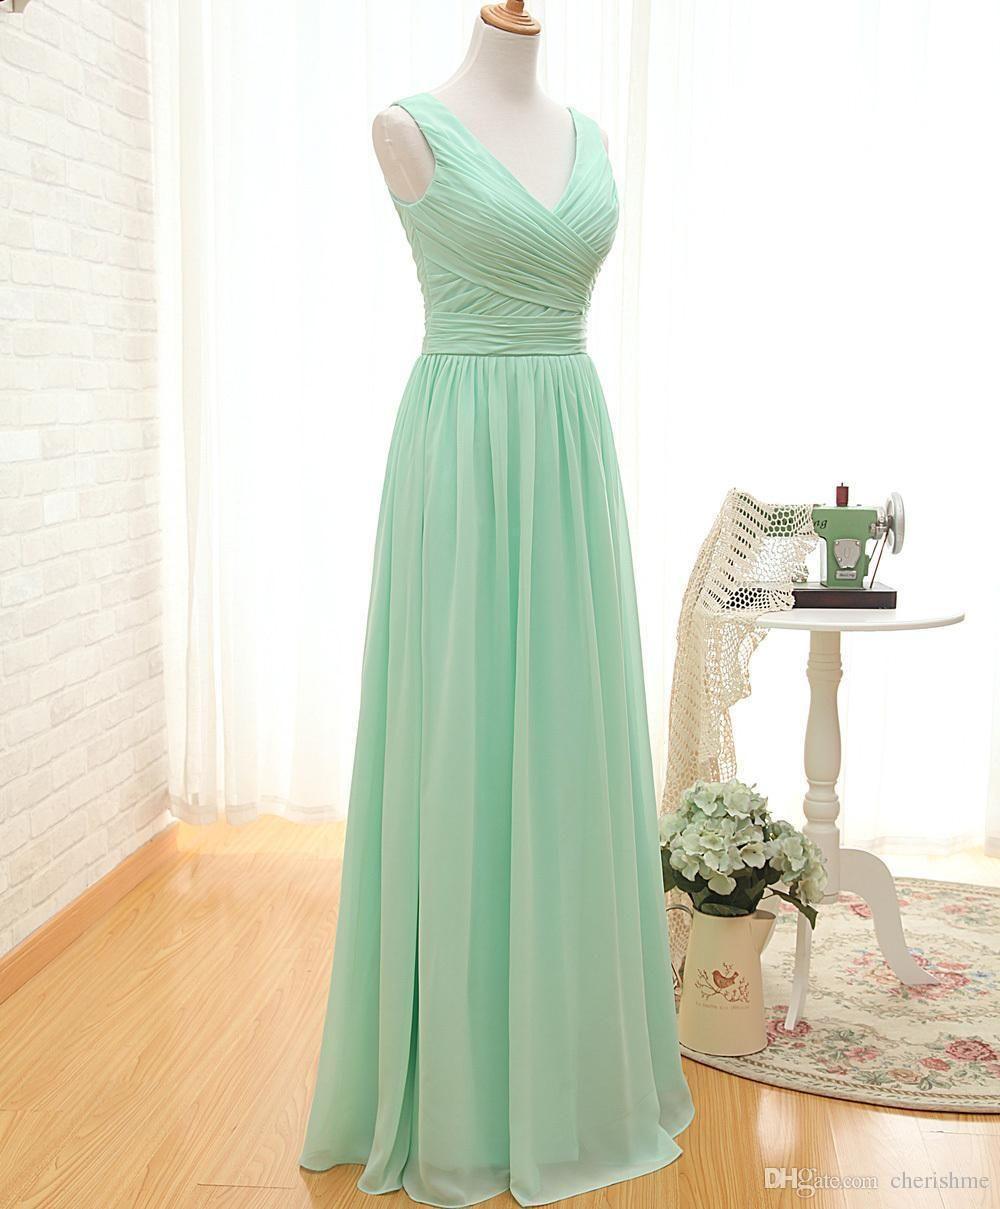 Alluring mint green bridesmaid dresses long chiffon aline floor